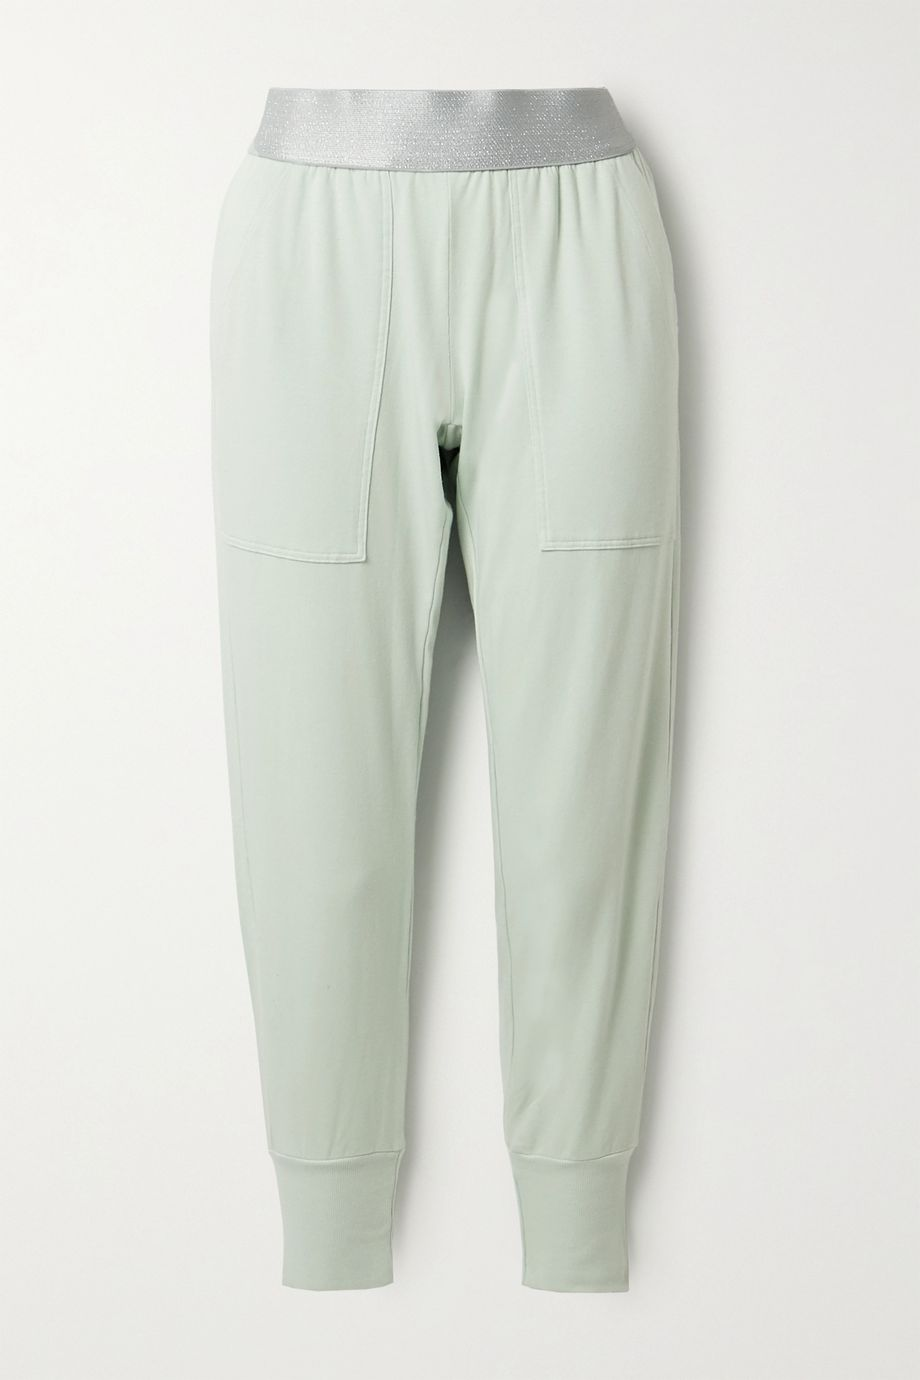 Heroine Sport Pantalon de survêtement en jersey stretch